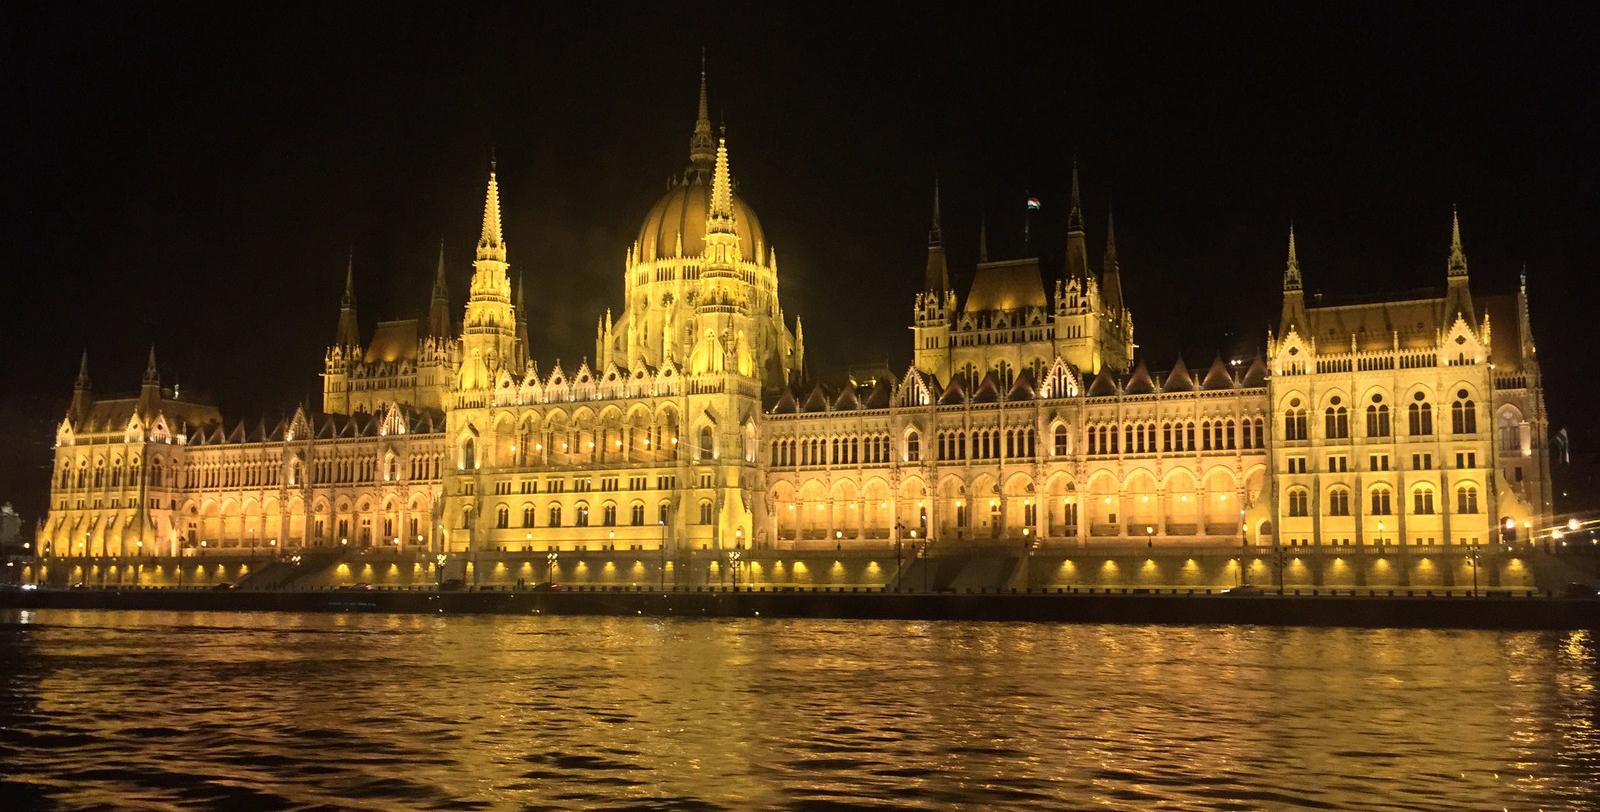 Qué ver en Budapest en un fin de semana: Parlamento de Budapest budapest en un fin de semana - 21234238800 304d99b094 o - Qué ver en Budapest en un fin de semana